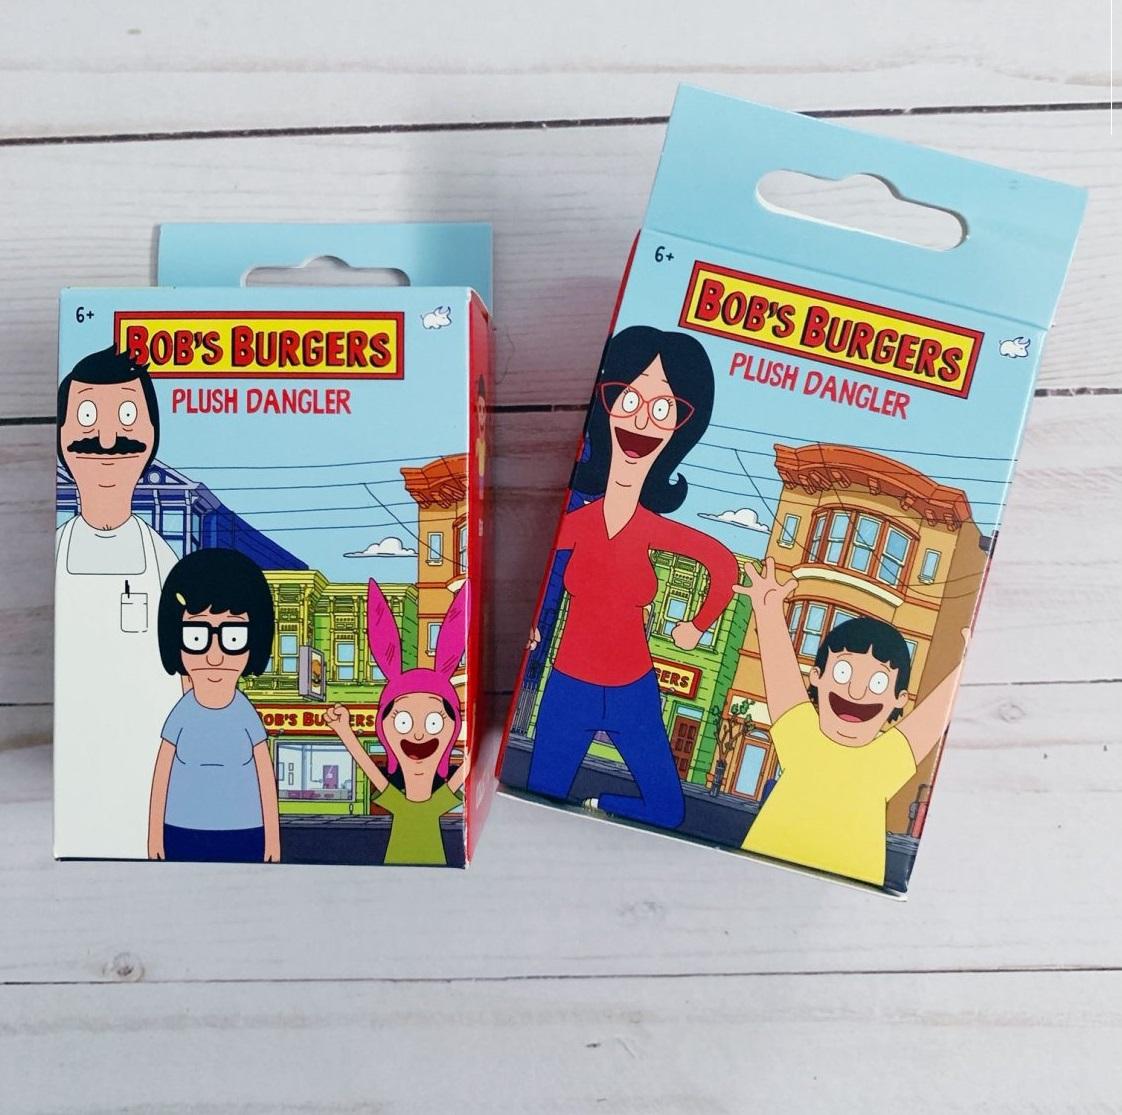 Bob's Burgers Plush Dangler